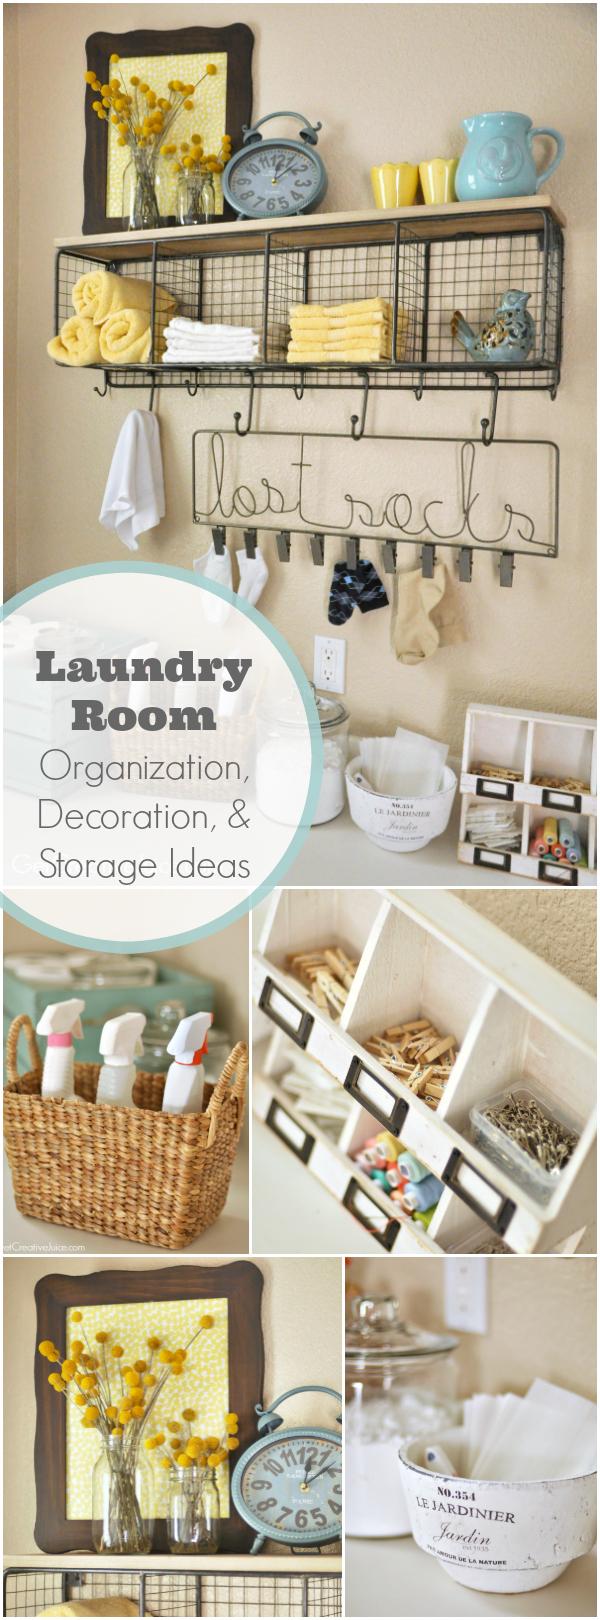 Laundry Room Organization and Storage Ideas - Creative Juice on Laundry Room Organization Ideas  id=93213